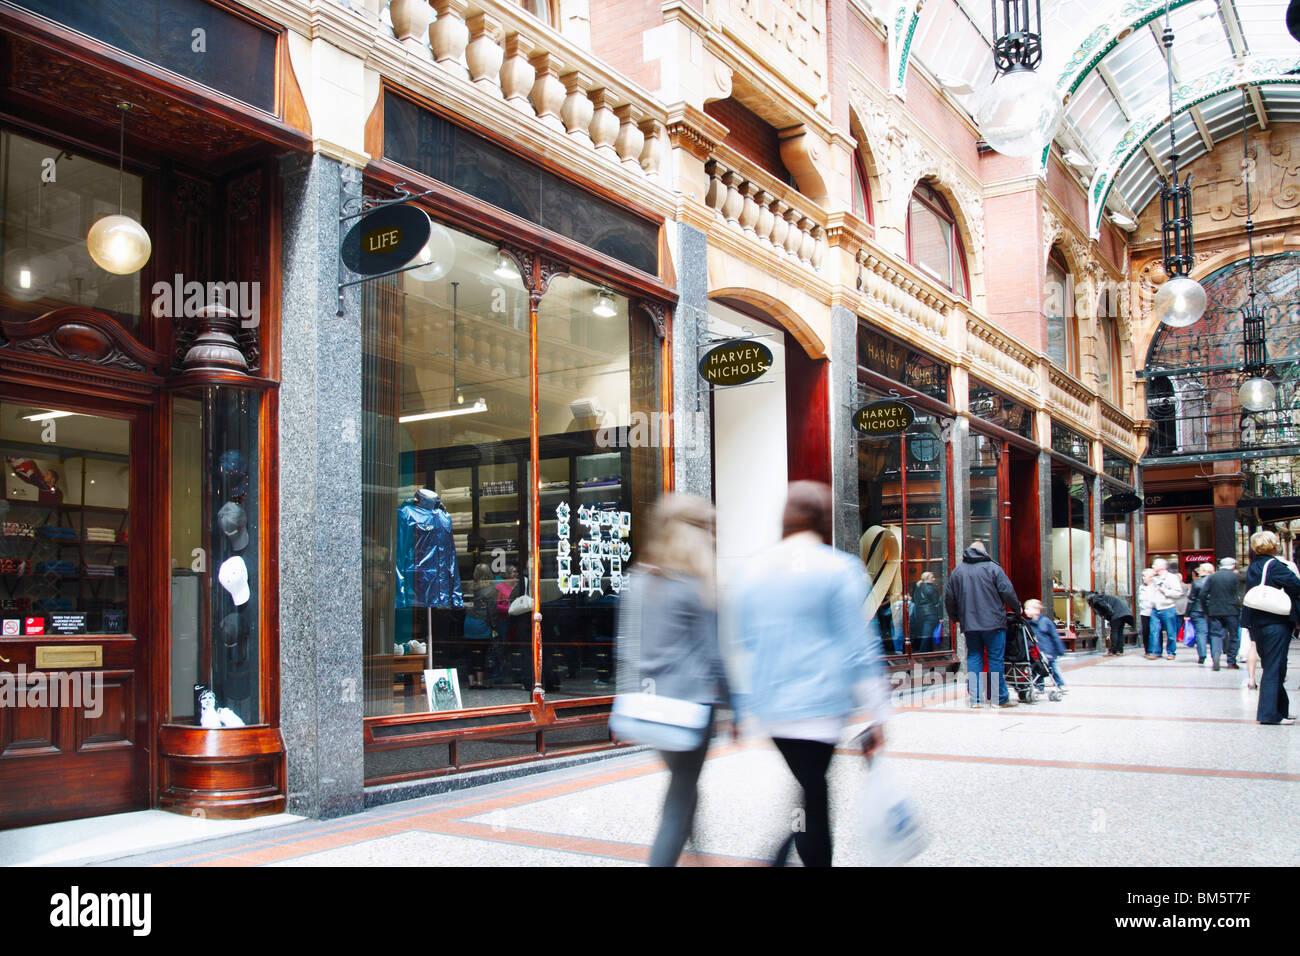 Harvey Nichols cafe outside Harvey Nichols store in the Victoria Quarter on Briggate, Leeds, Yorkshire, England. - Stock Image